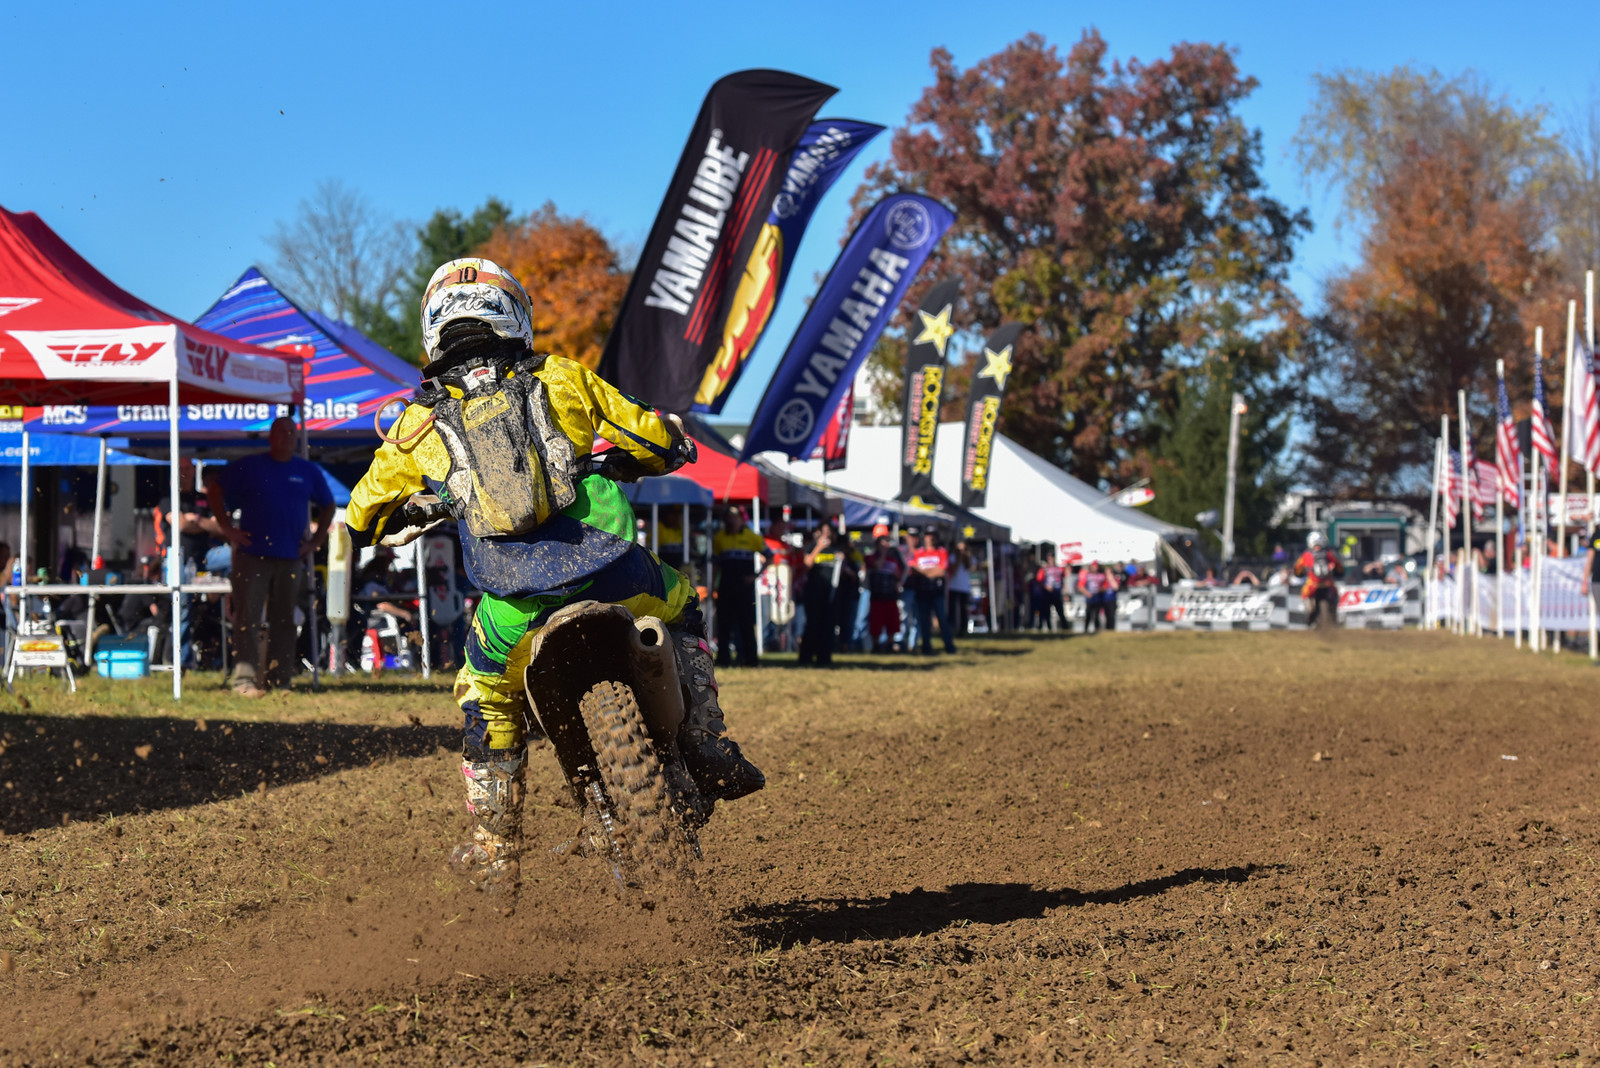 Another lap - Photo Blast: Ironman GNCC - Motocross Pictures - Vital MX